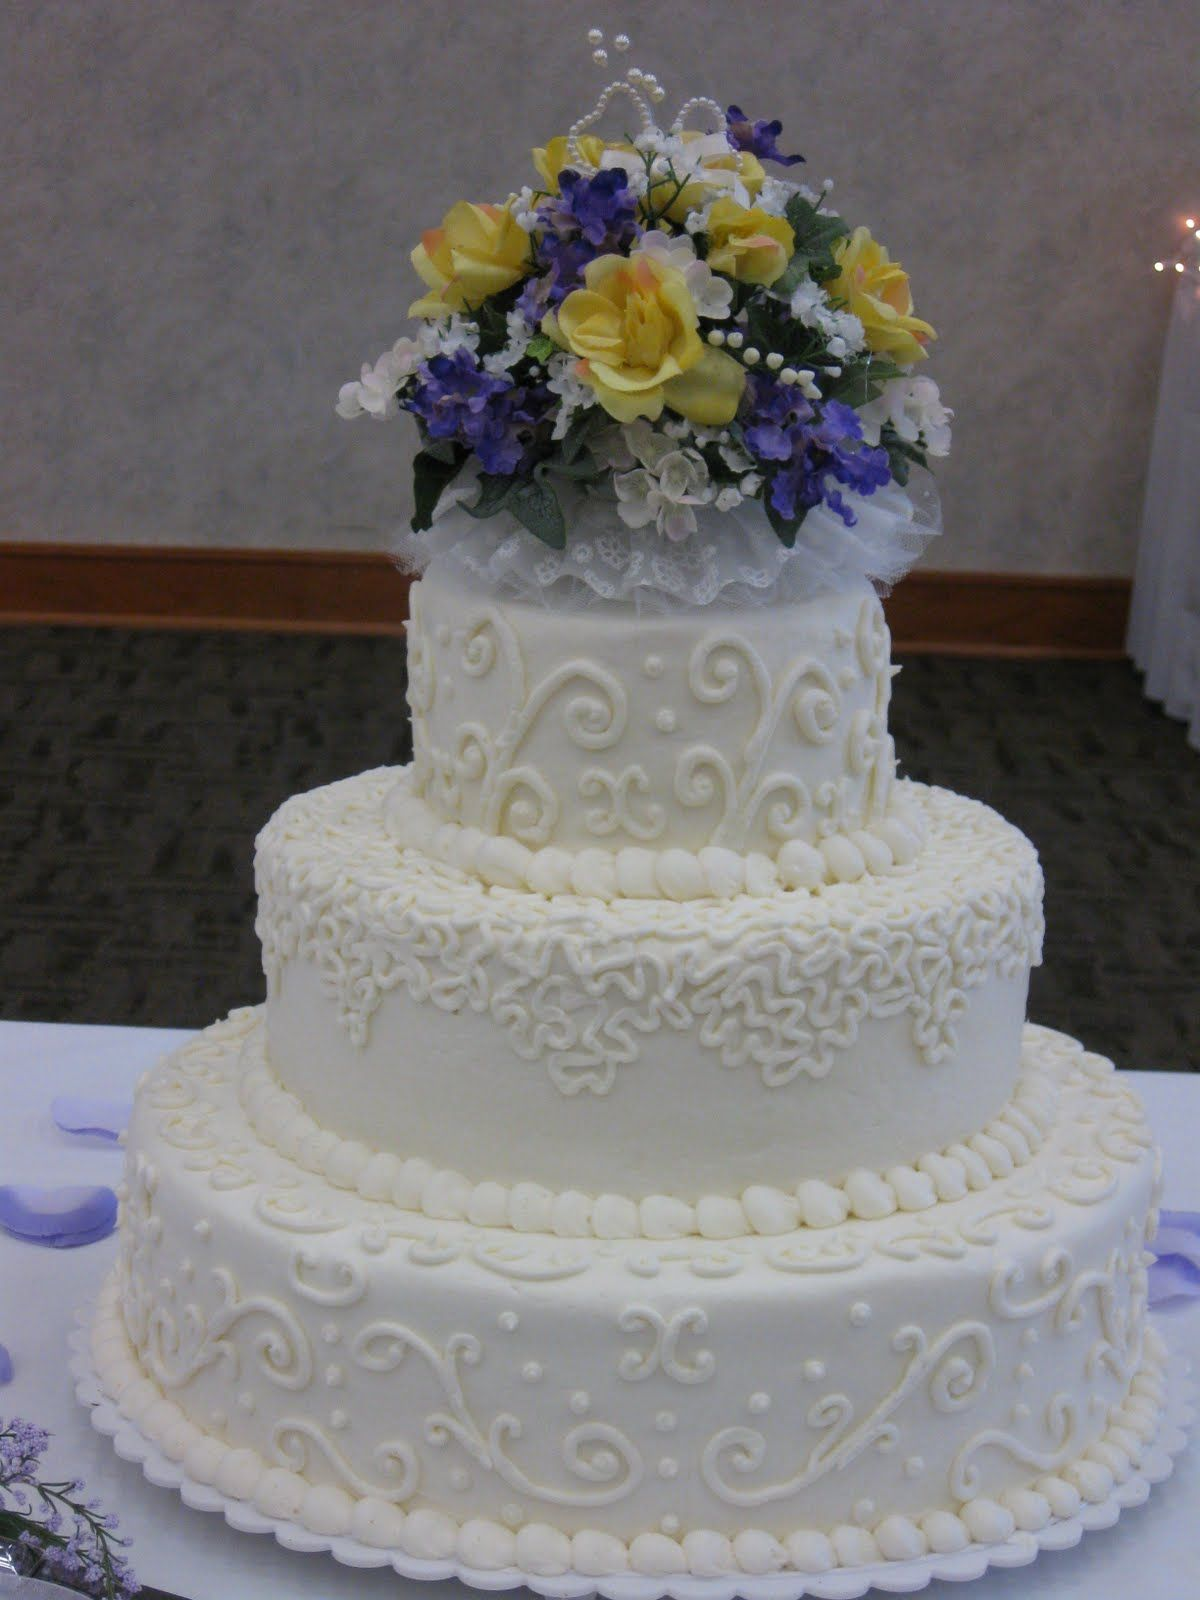 60th wedding anniversary decorations google search for 60th wedding anniversary decoration ideas